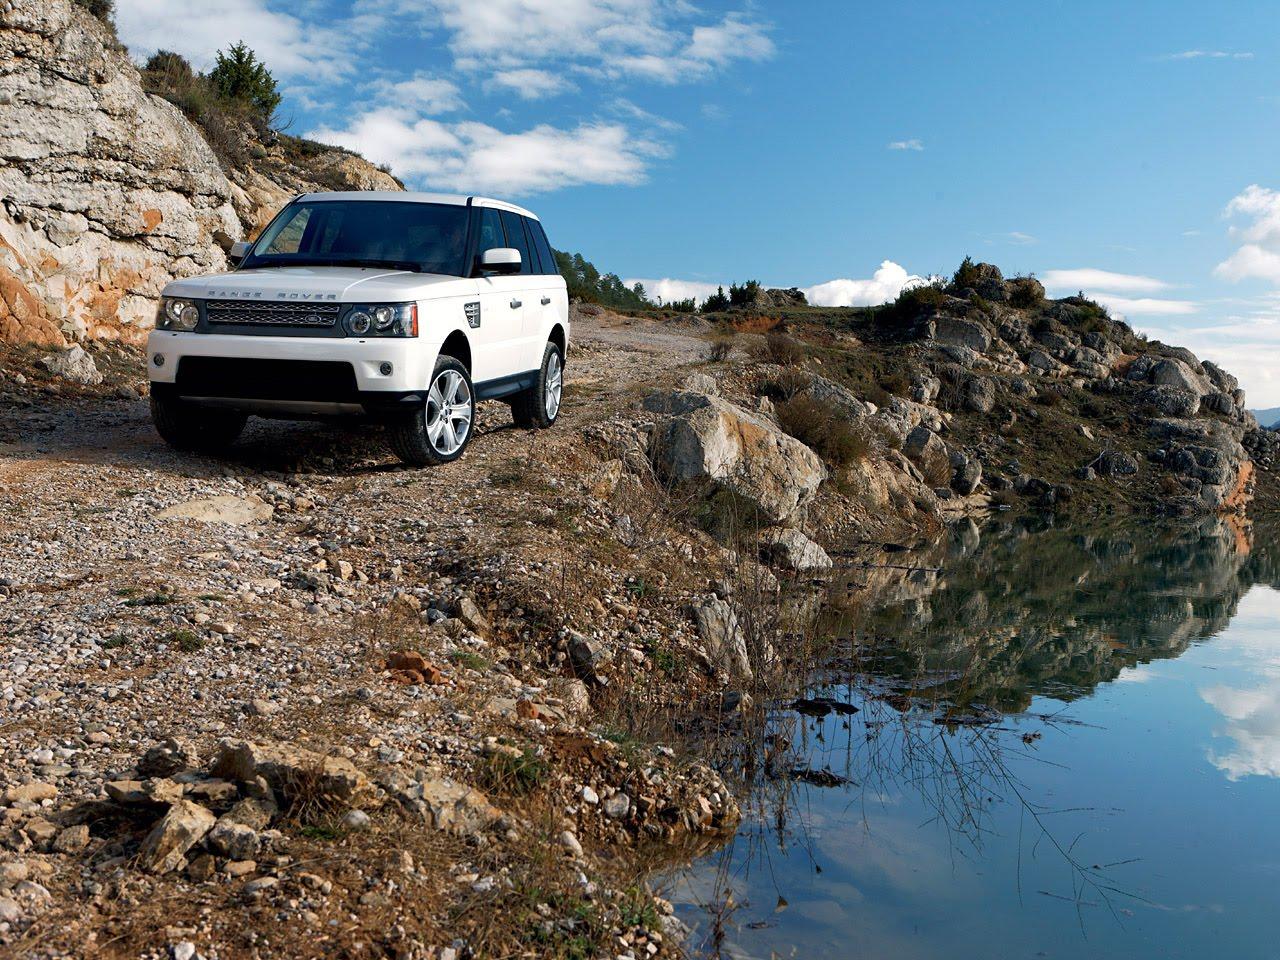 Wallpaper Gambar Mobil Sport: Gambar Land Rover Range Rover Sport Supercharged 2010